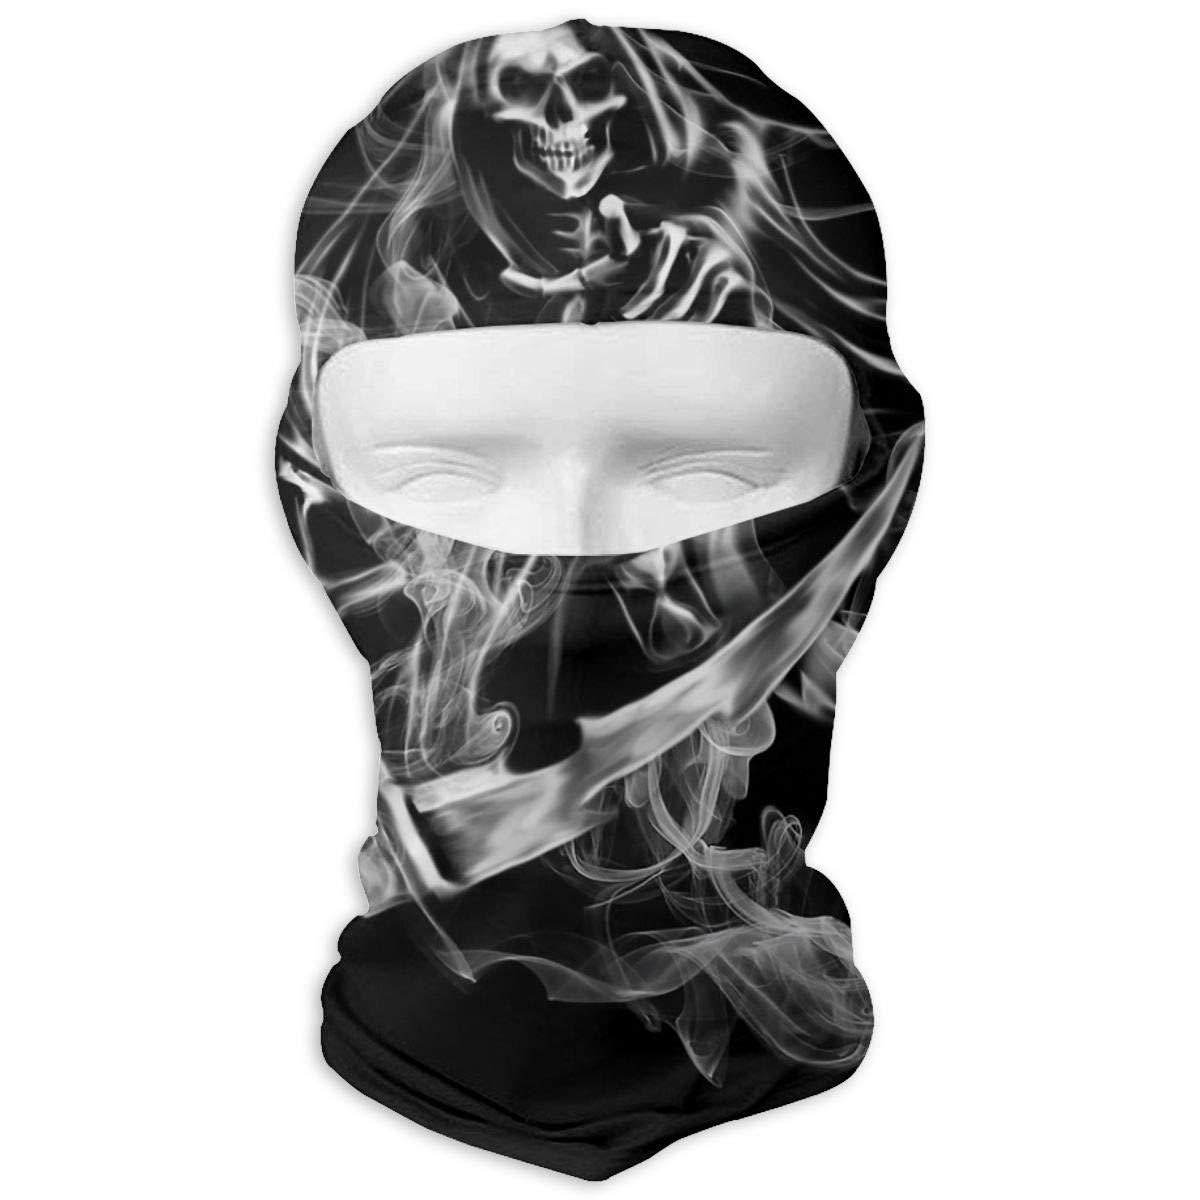 LaoJi Demon Winter Ski Mask Balaclava Hood - Wind-Resistant Face Mask